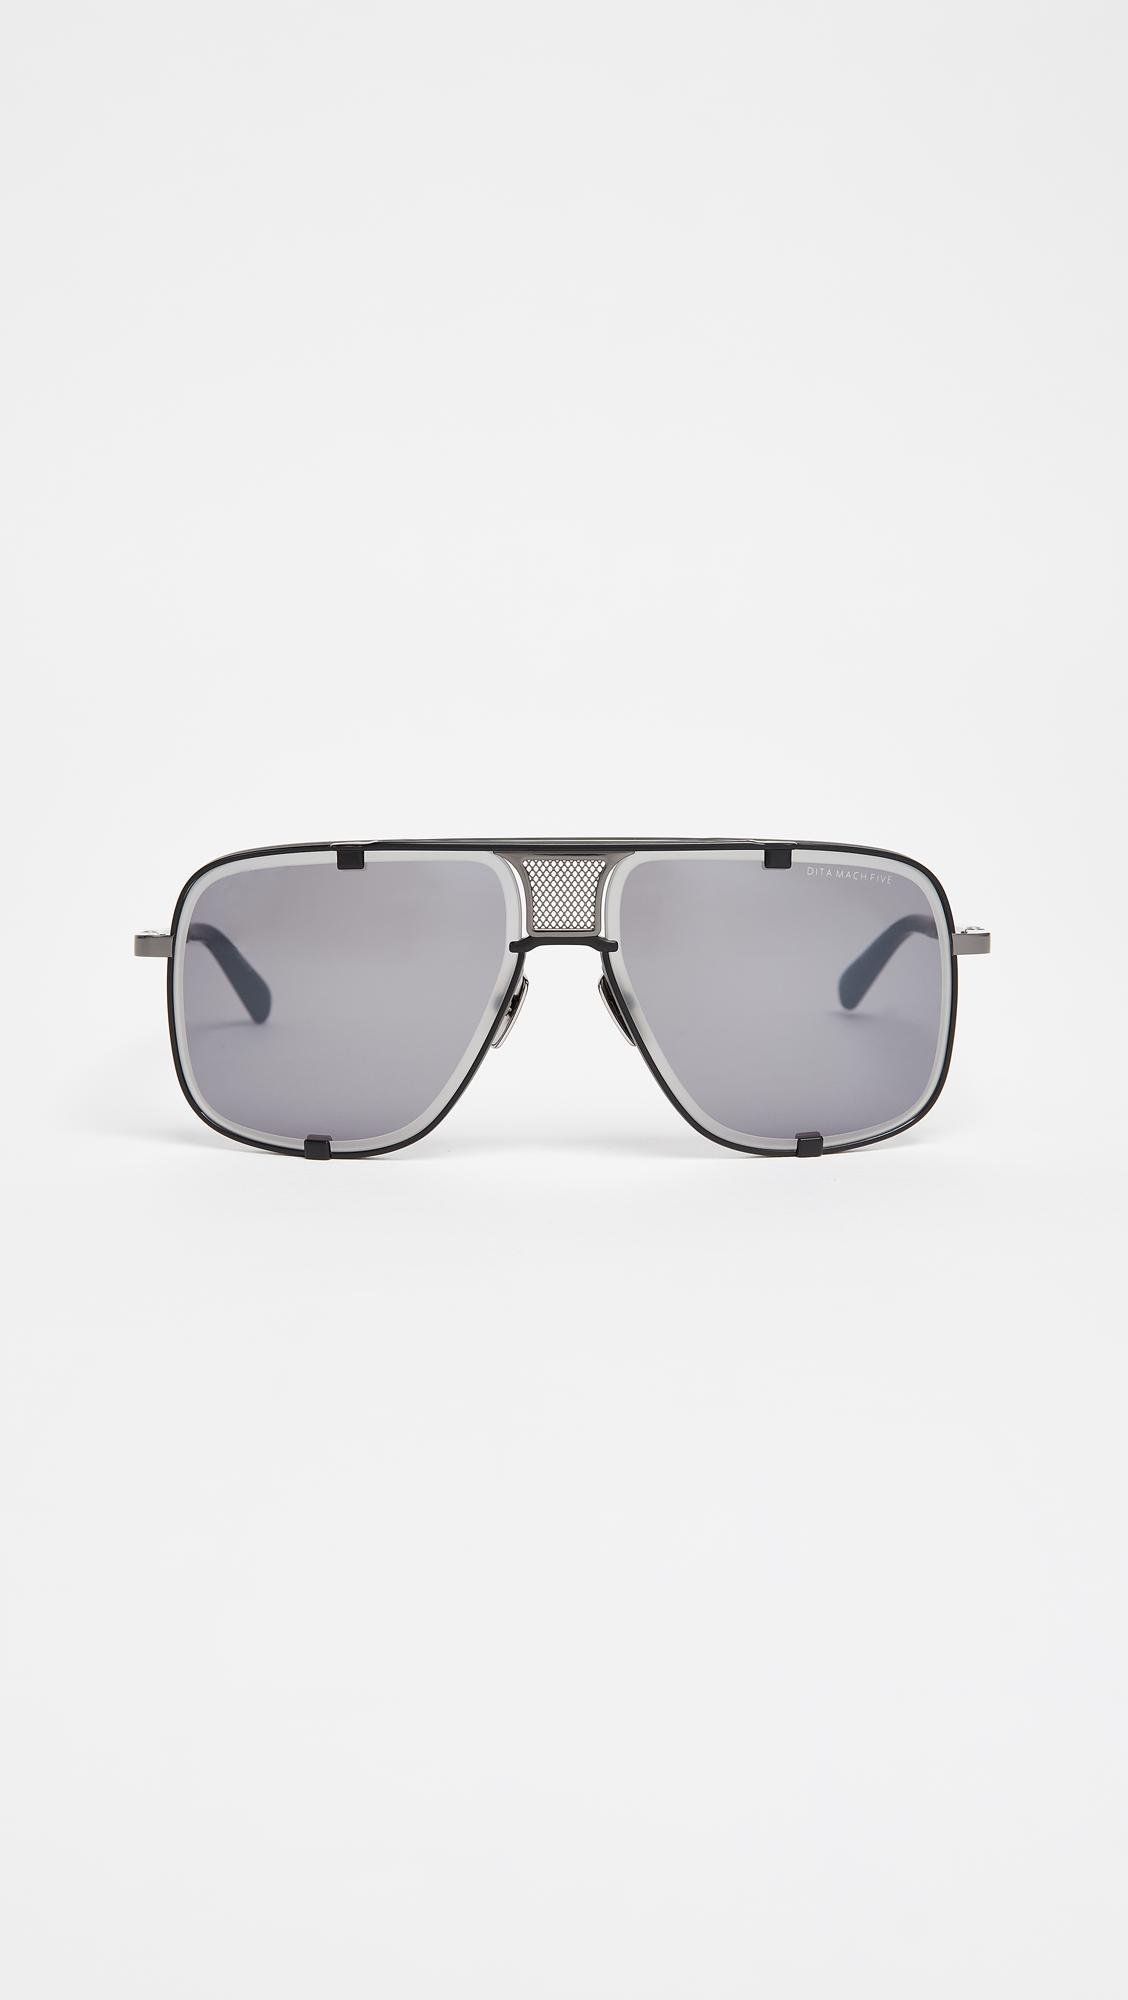 2607f21295f0 Lyst - DITA Mach Five Limited Edition Sunglasses in Gray